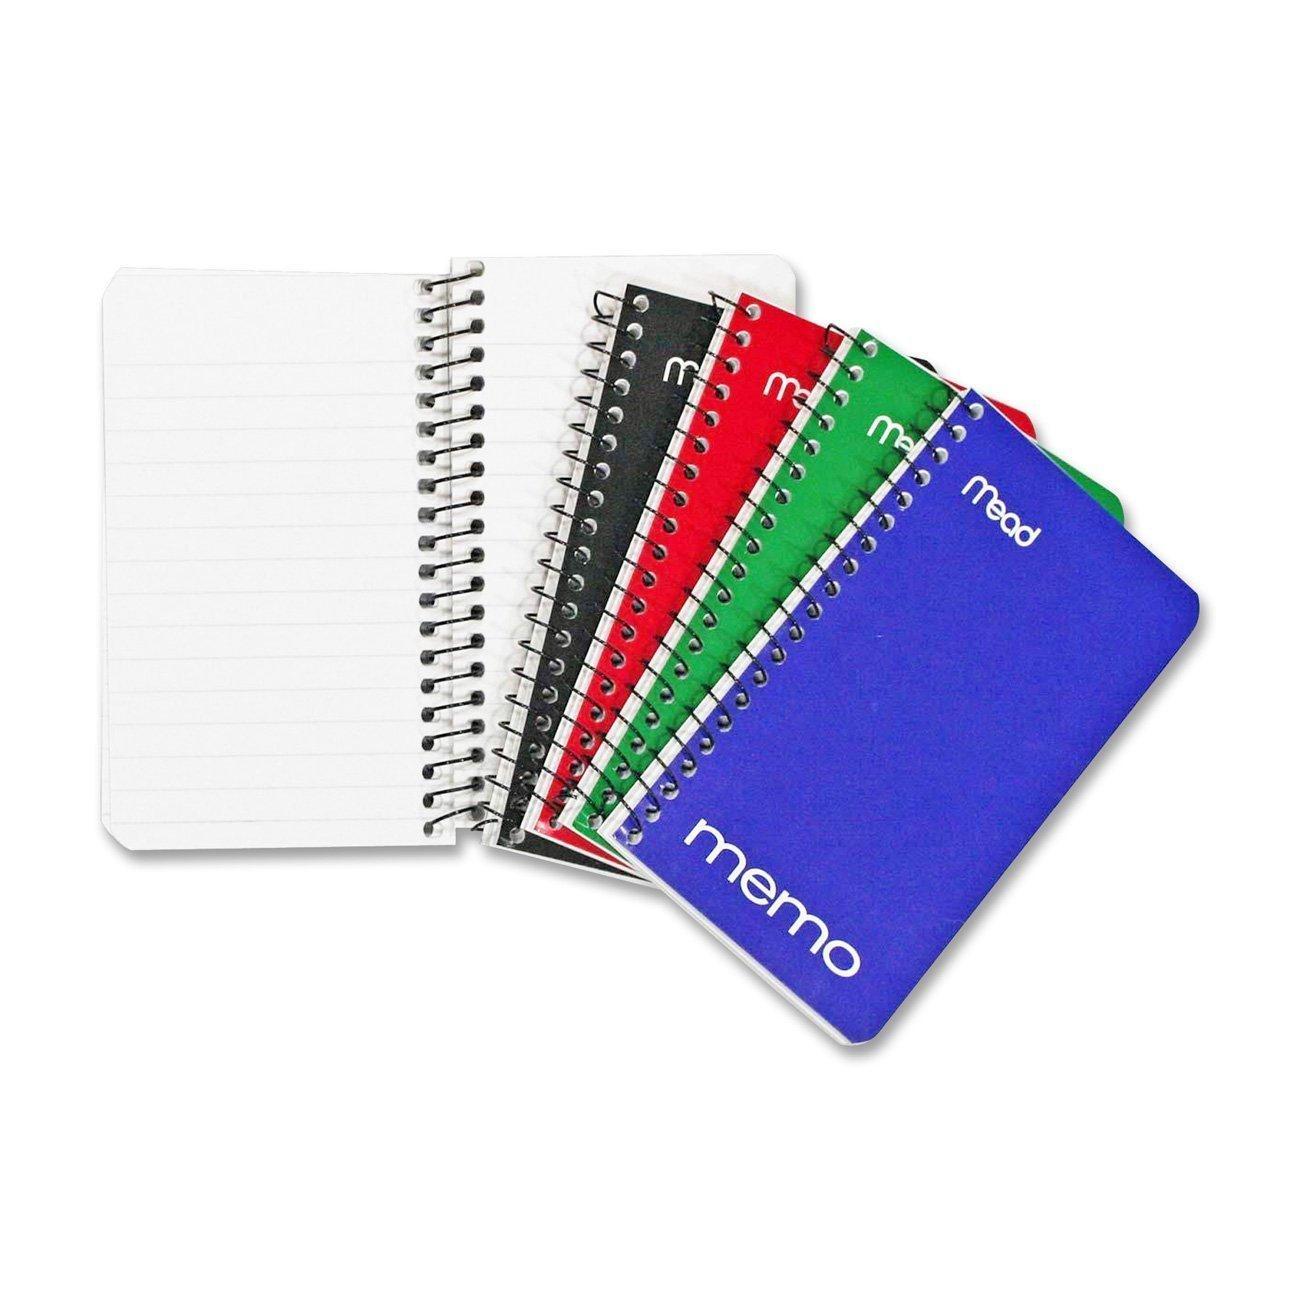 amazon com mead small spiral notebook spiral memo pad college